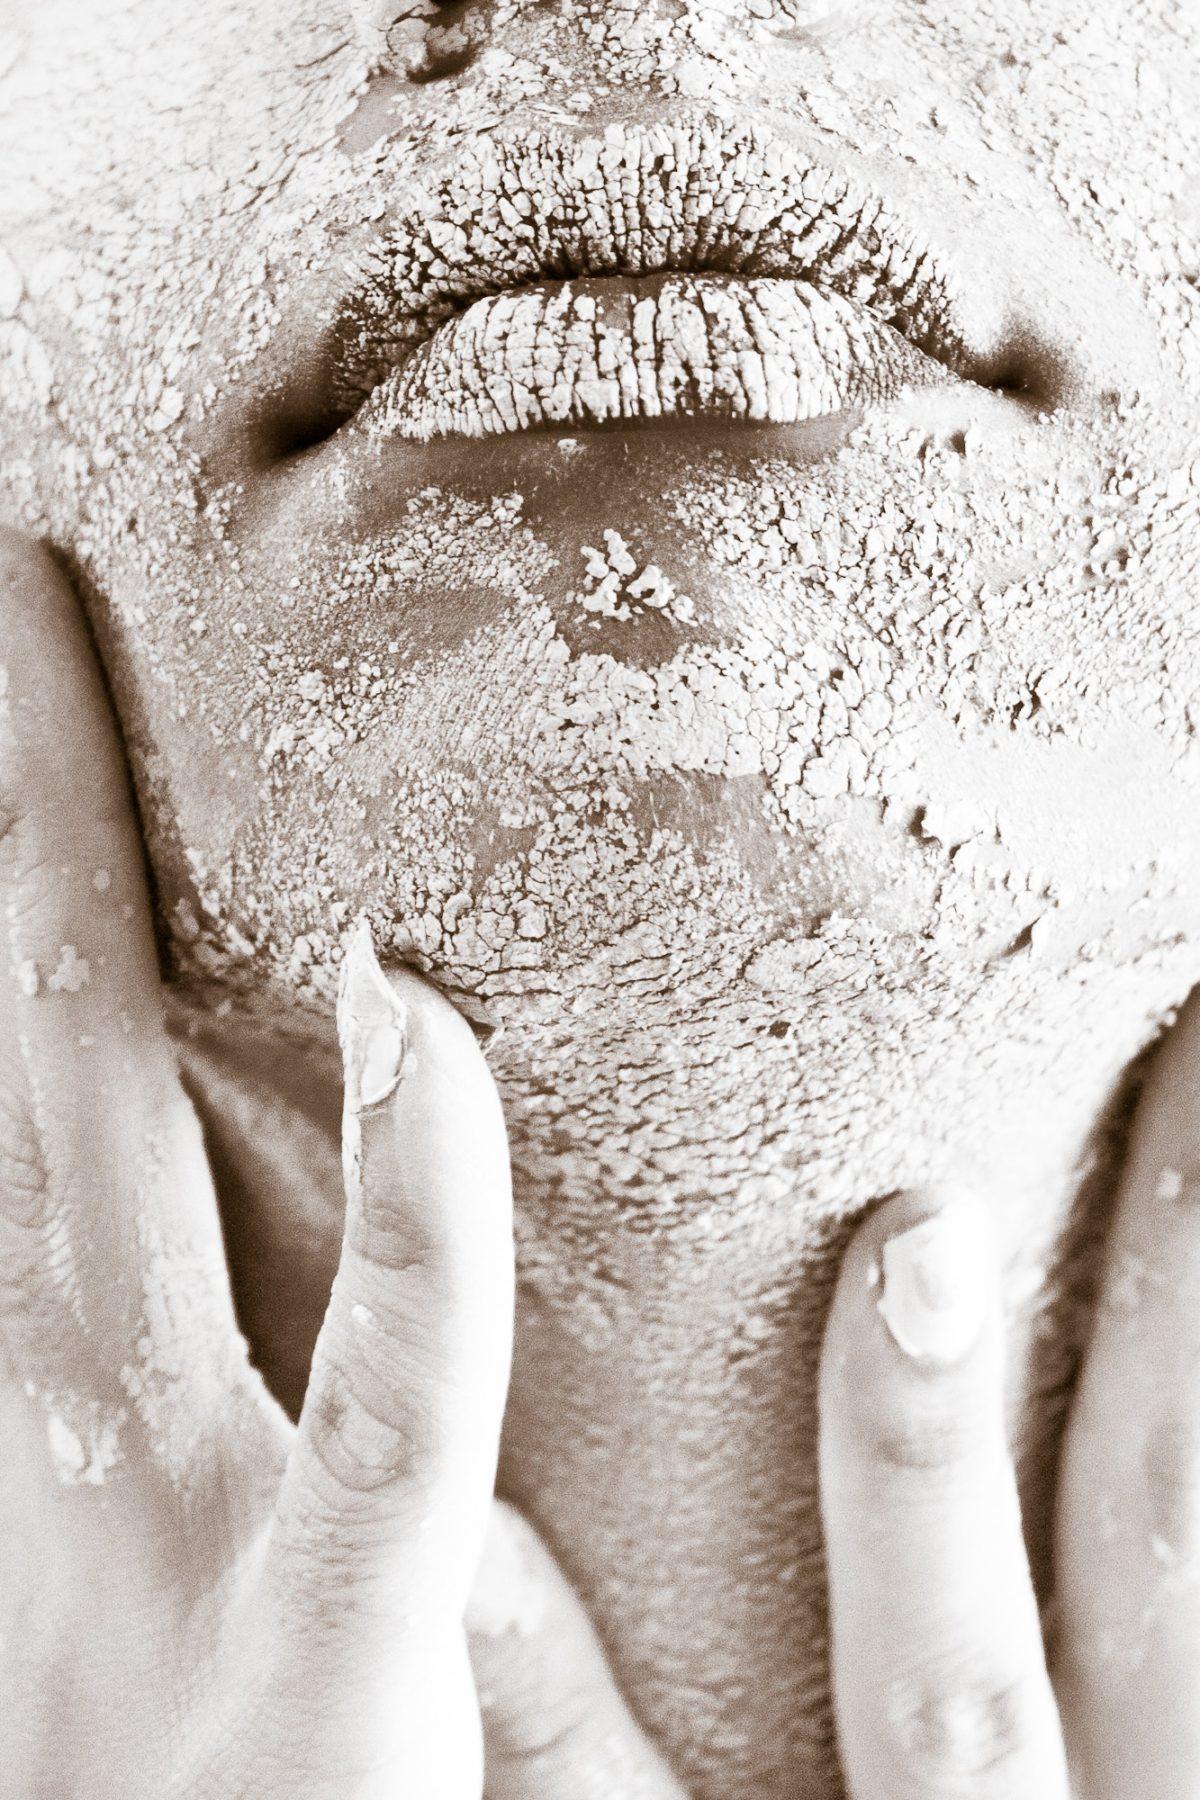 dirty-female-hands-682501-1200x1800.jpg